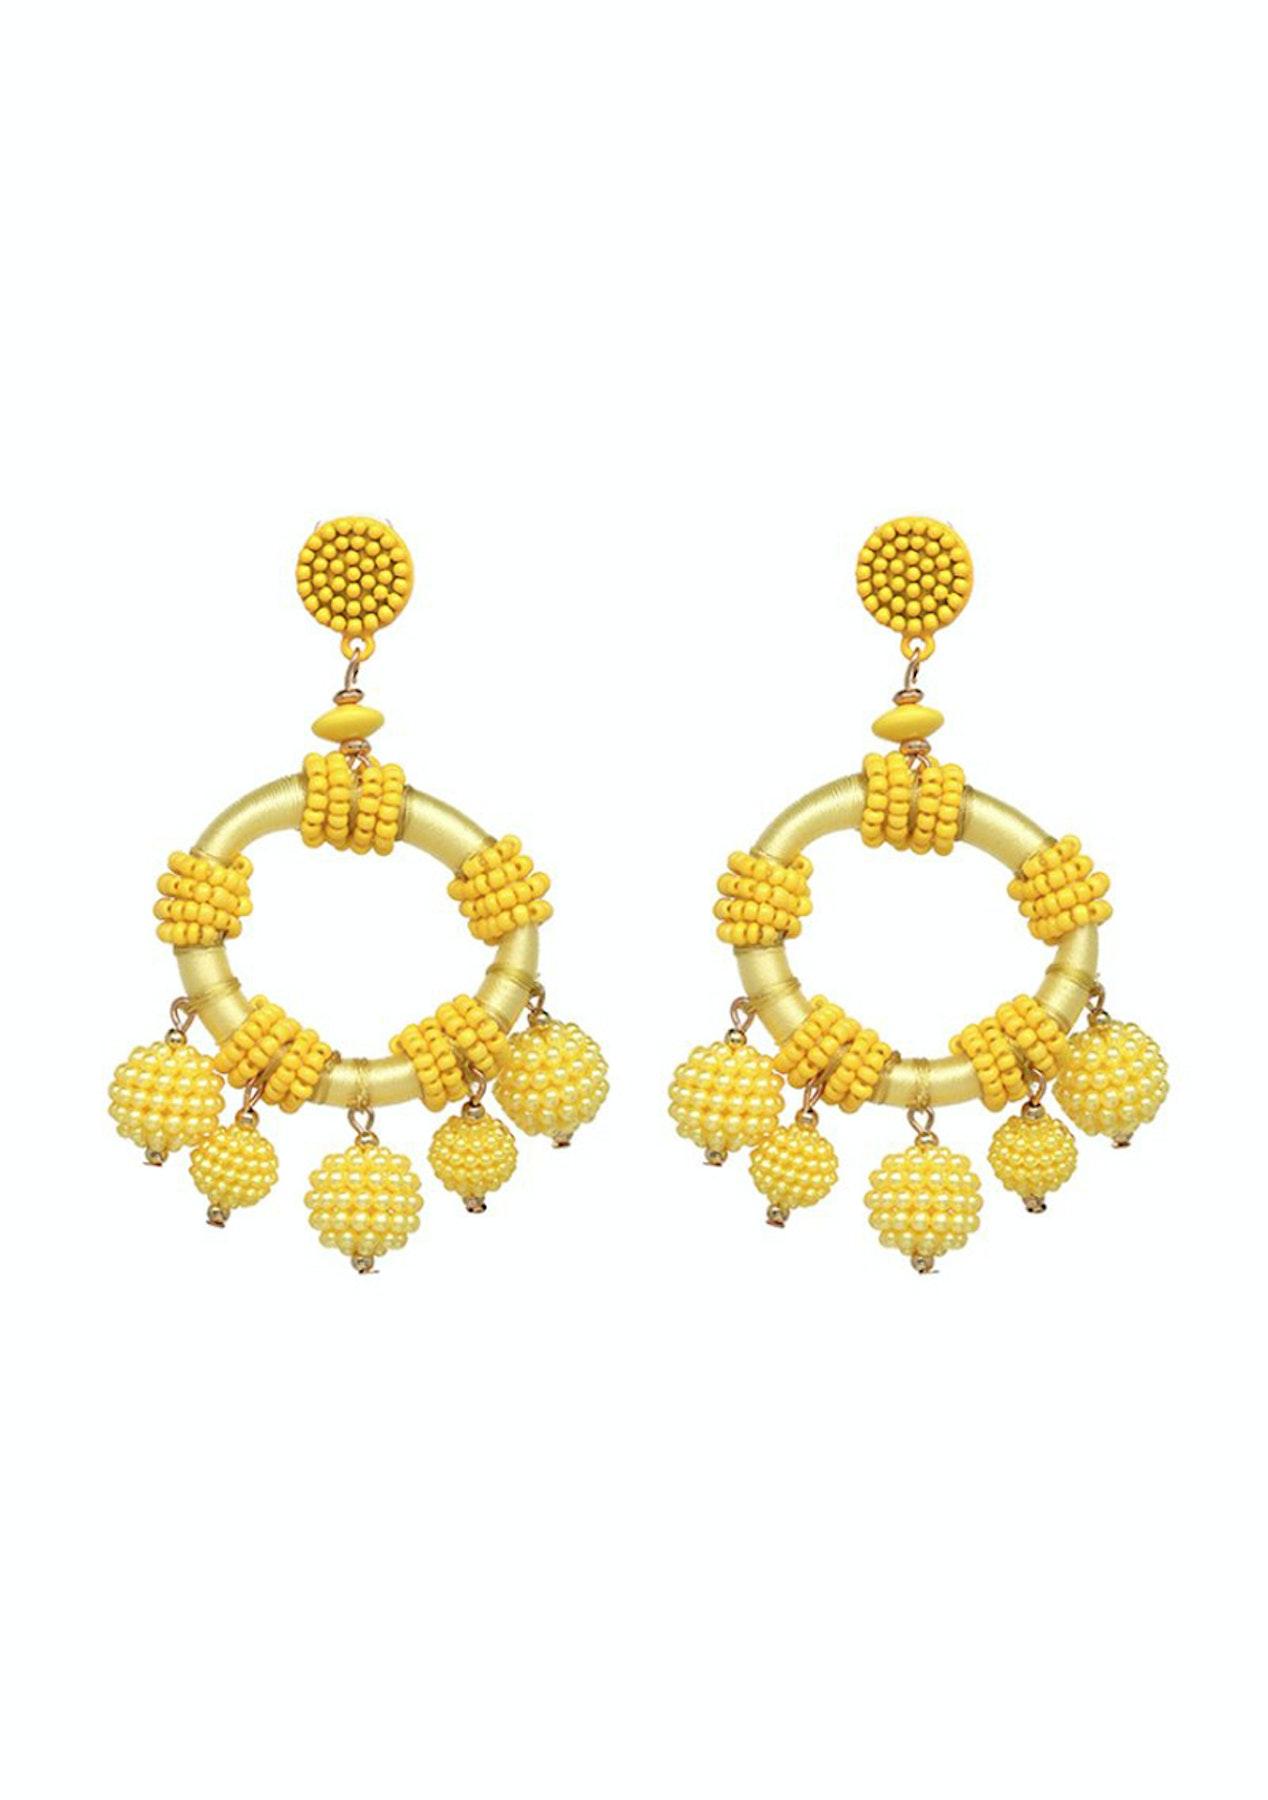 f8370ee604ade ELLE LOUISE - Aria Earrings - Yellow